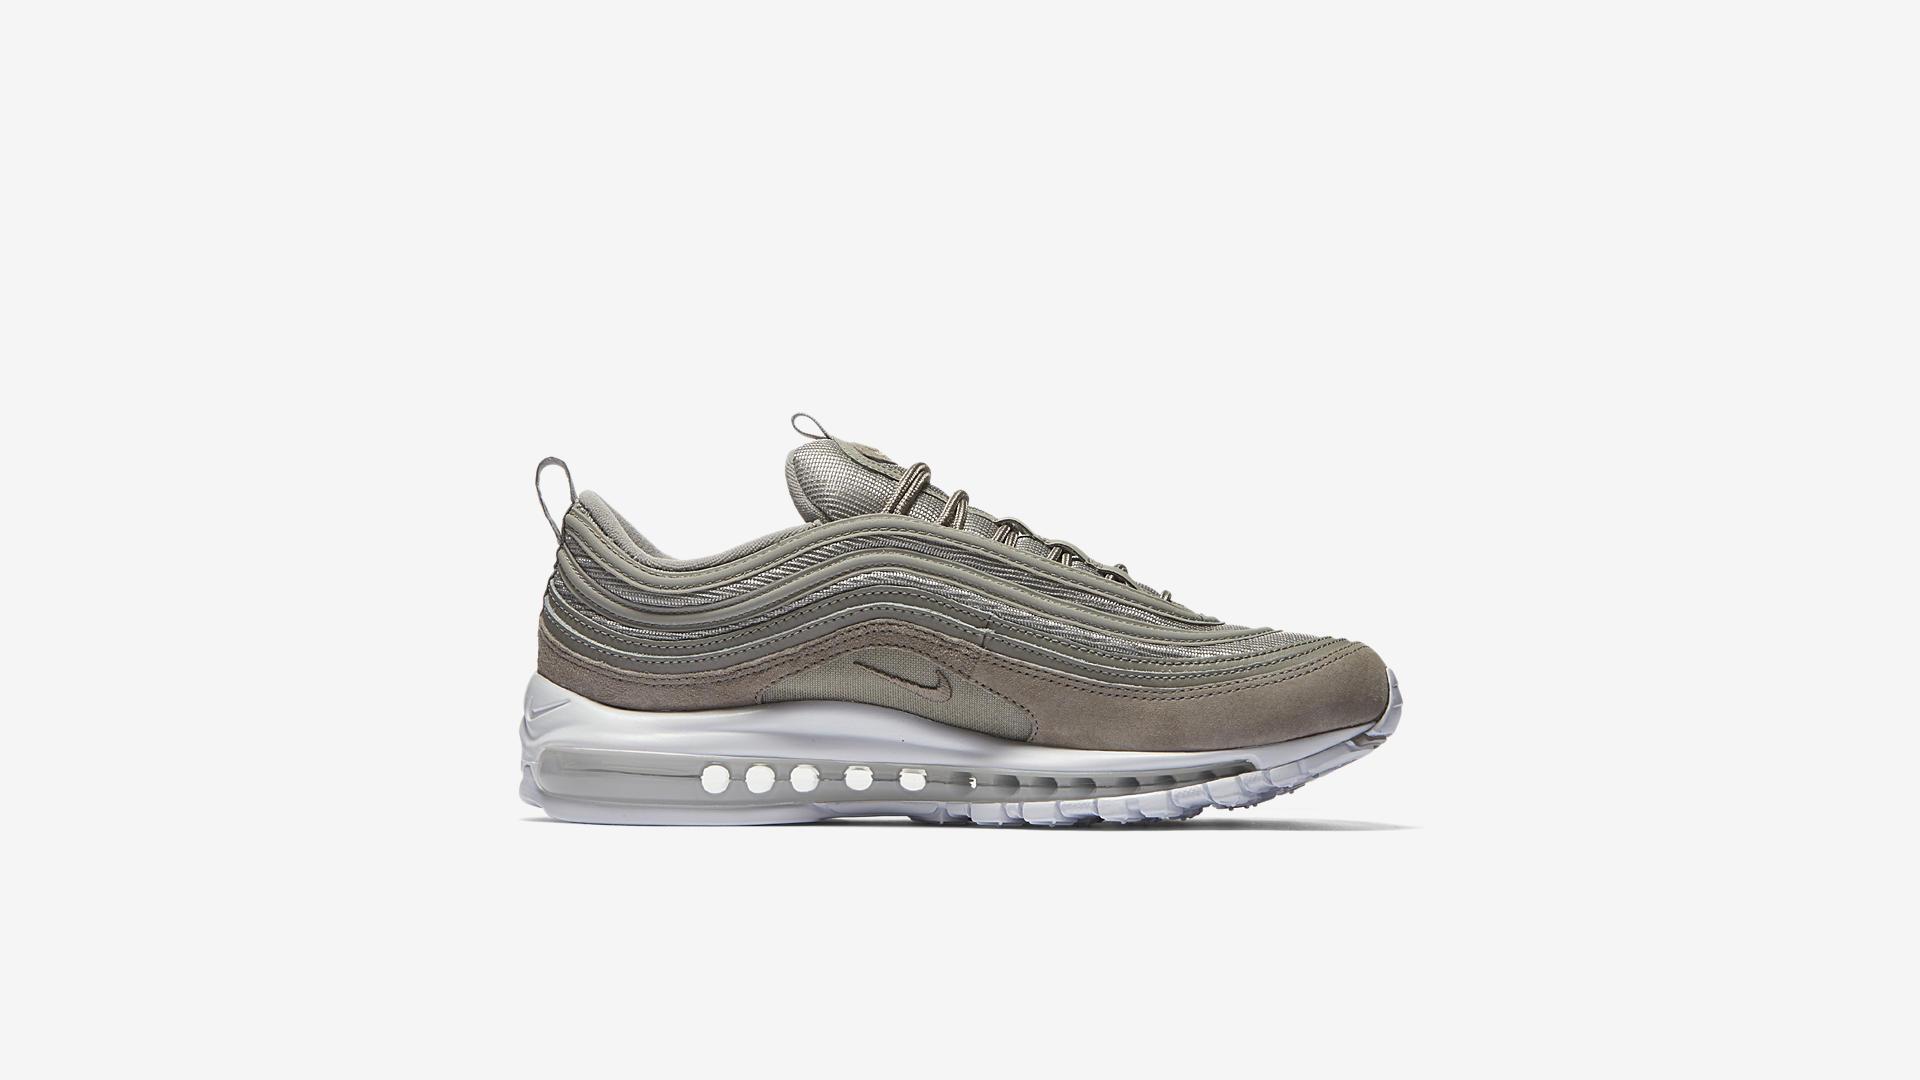 921826 002 Nike Air Max 97 Premium Cobblestone 4